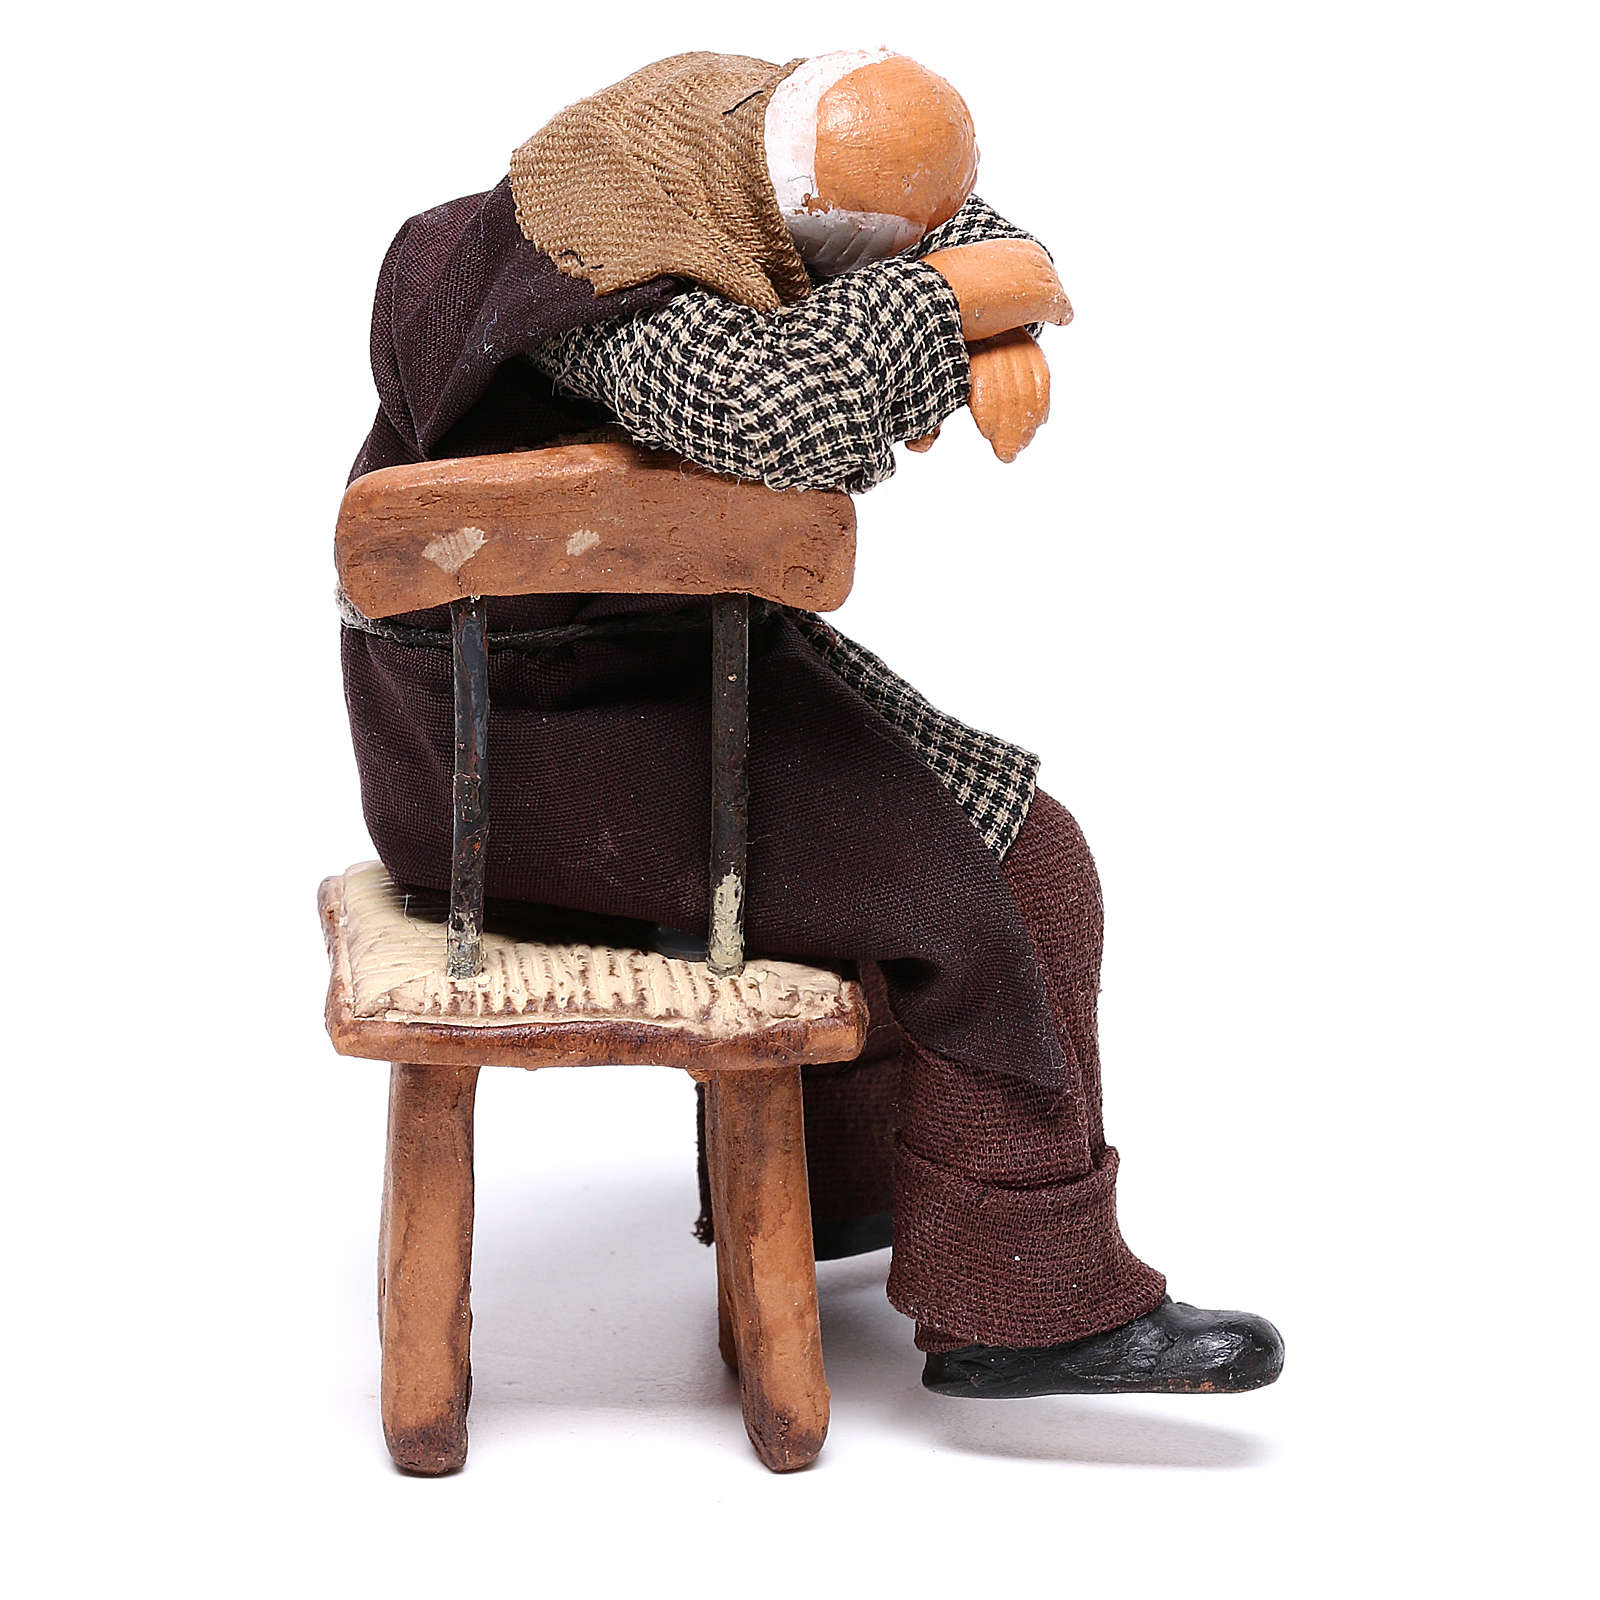 Ubriaco dorme su sedia 12 cm presepe Napoli 4